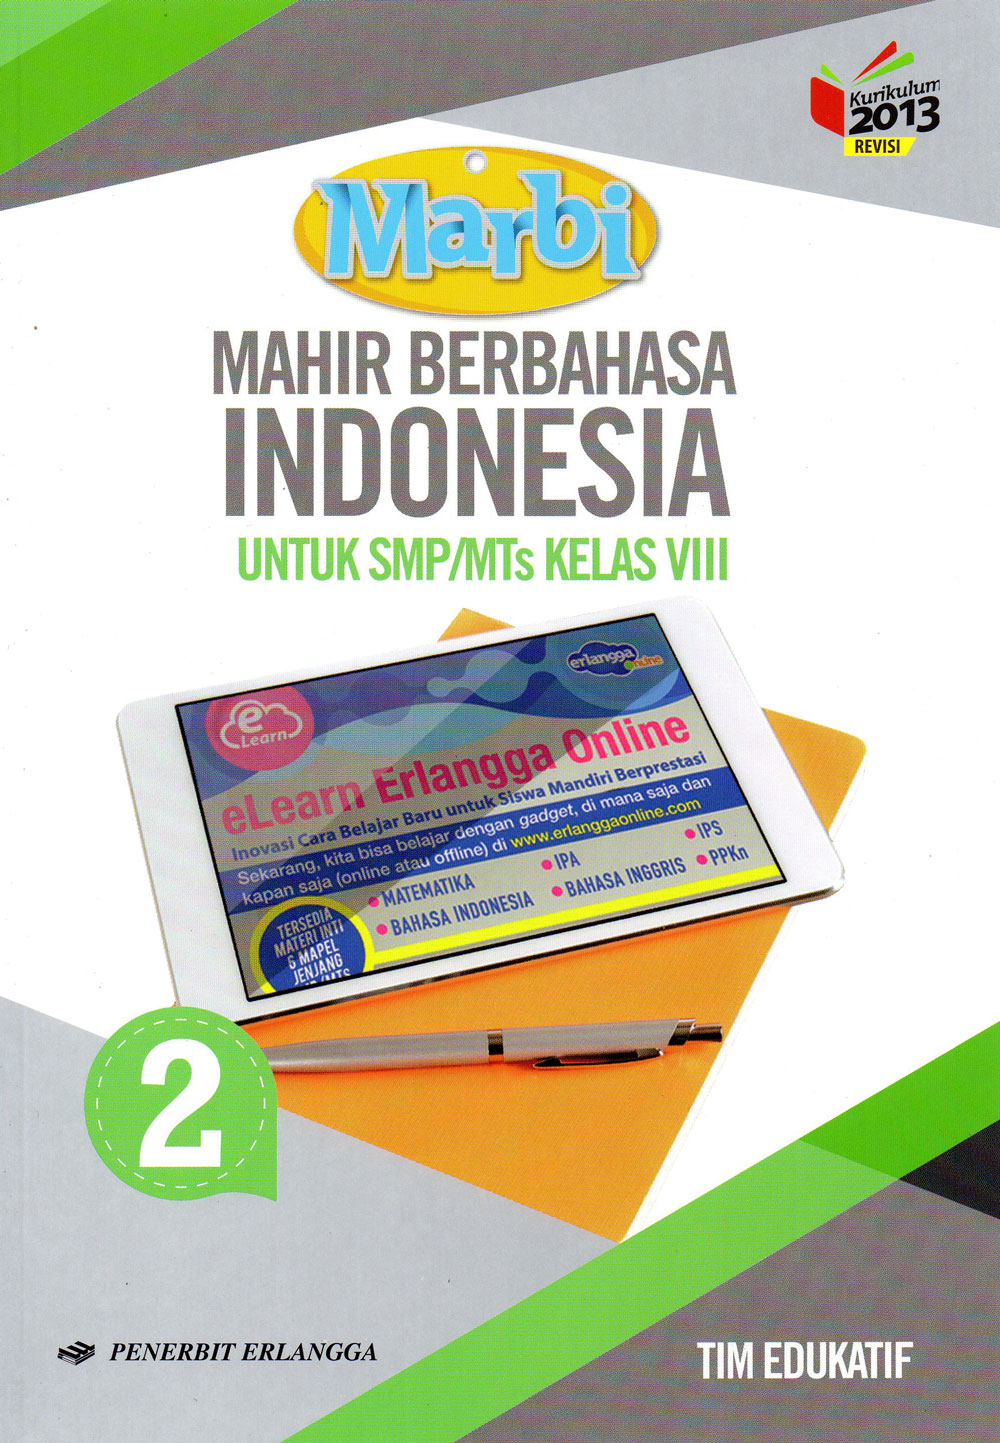 SMP/MTS Kelas VIII Kurikulum 2013 Mahir Berbahasa Indonesia